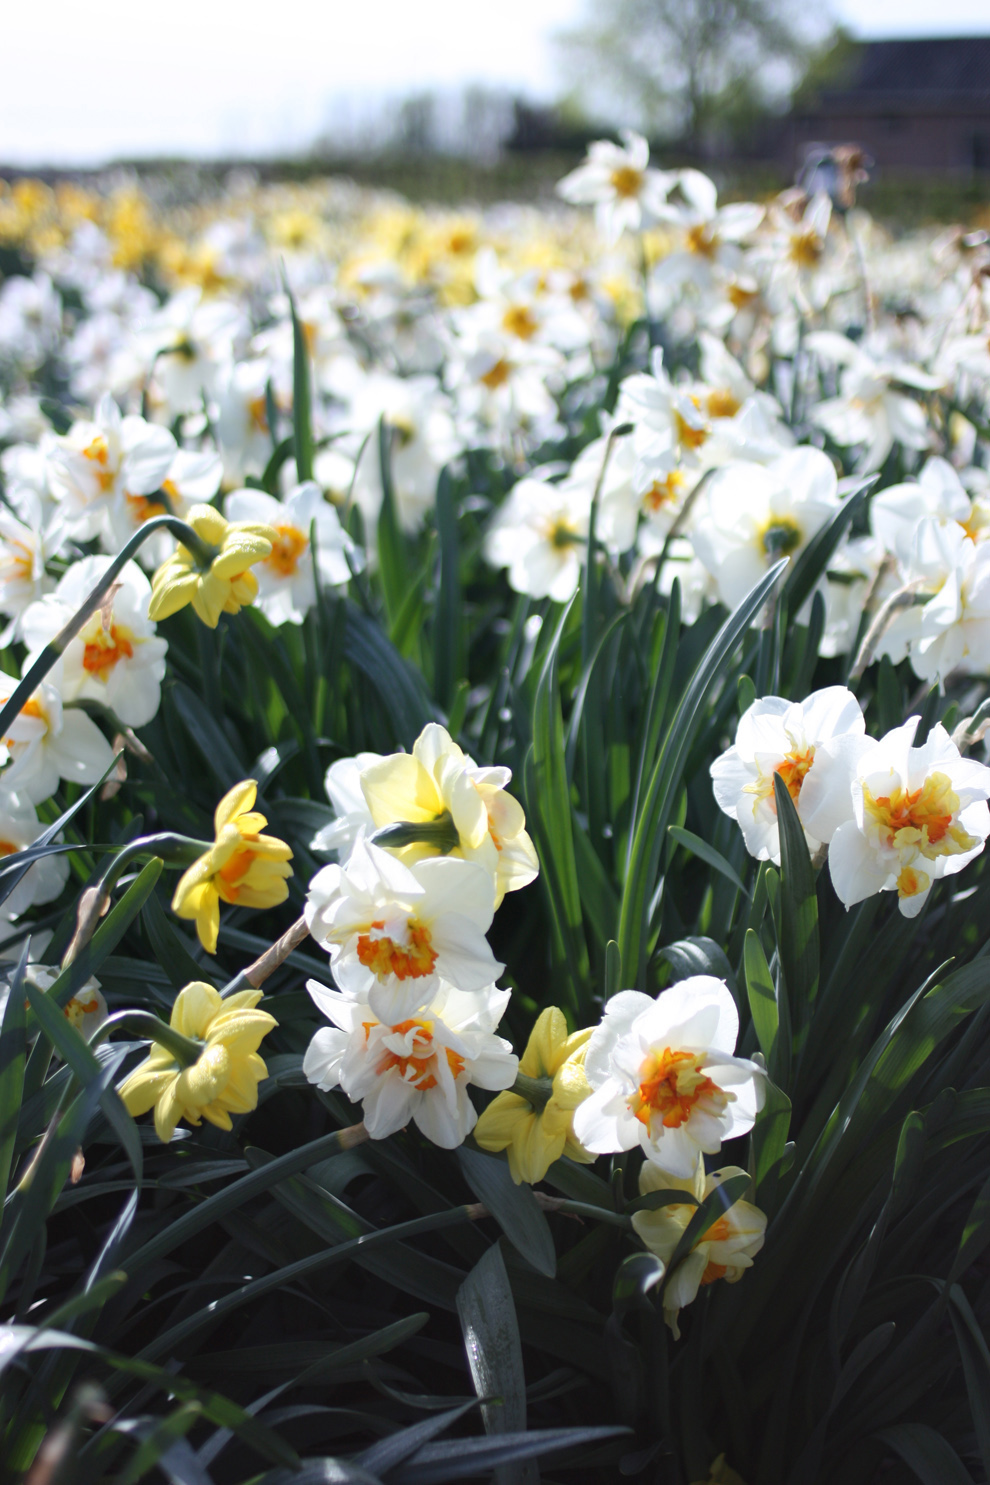 Keukenhof14_Hortus_Bolburum_daffodils_field.jpg